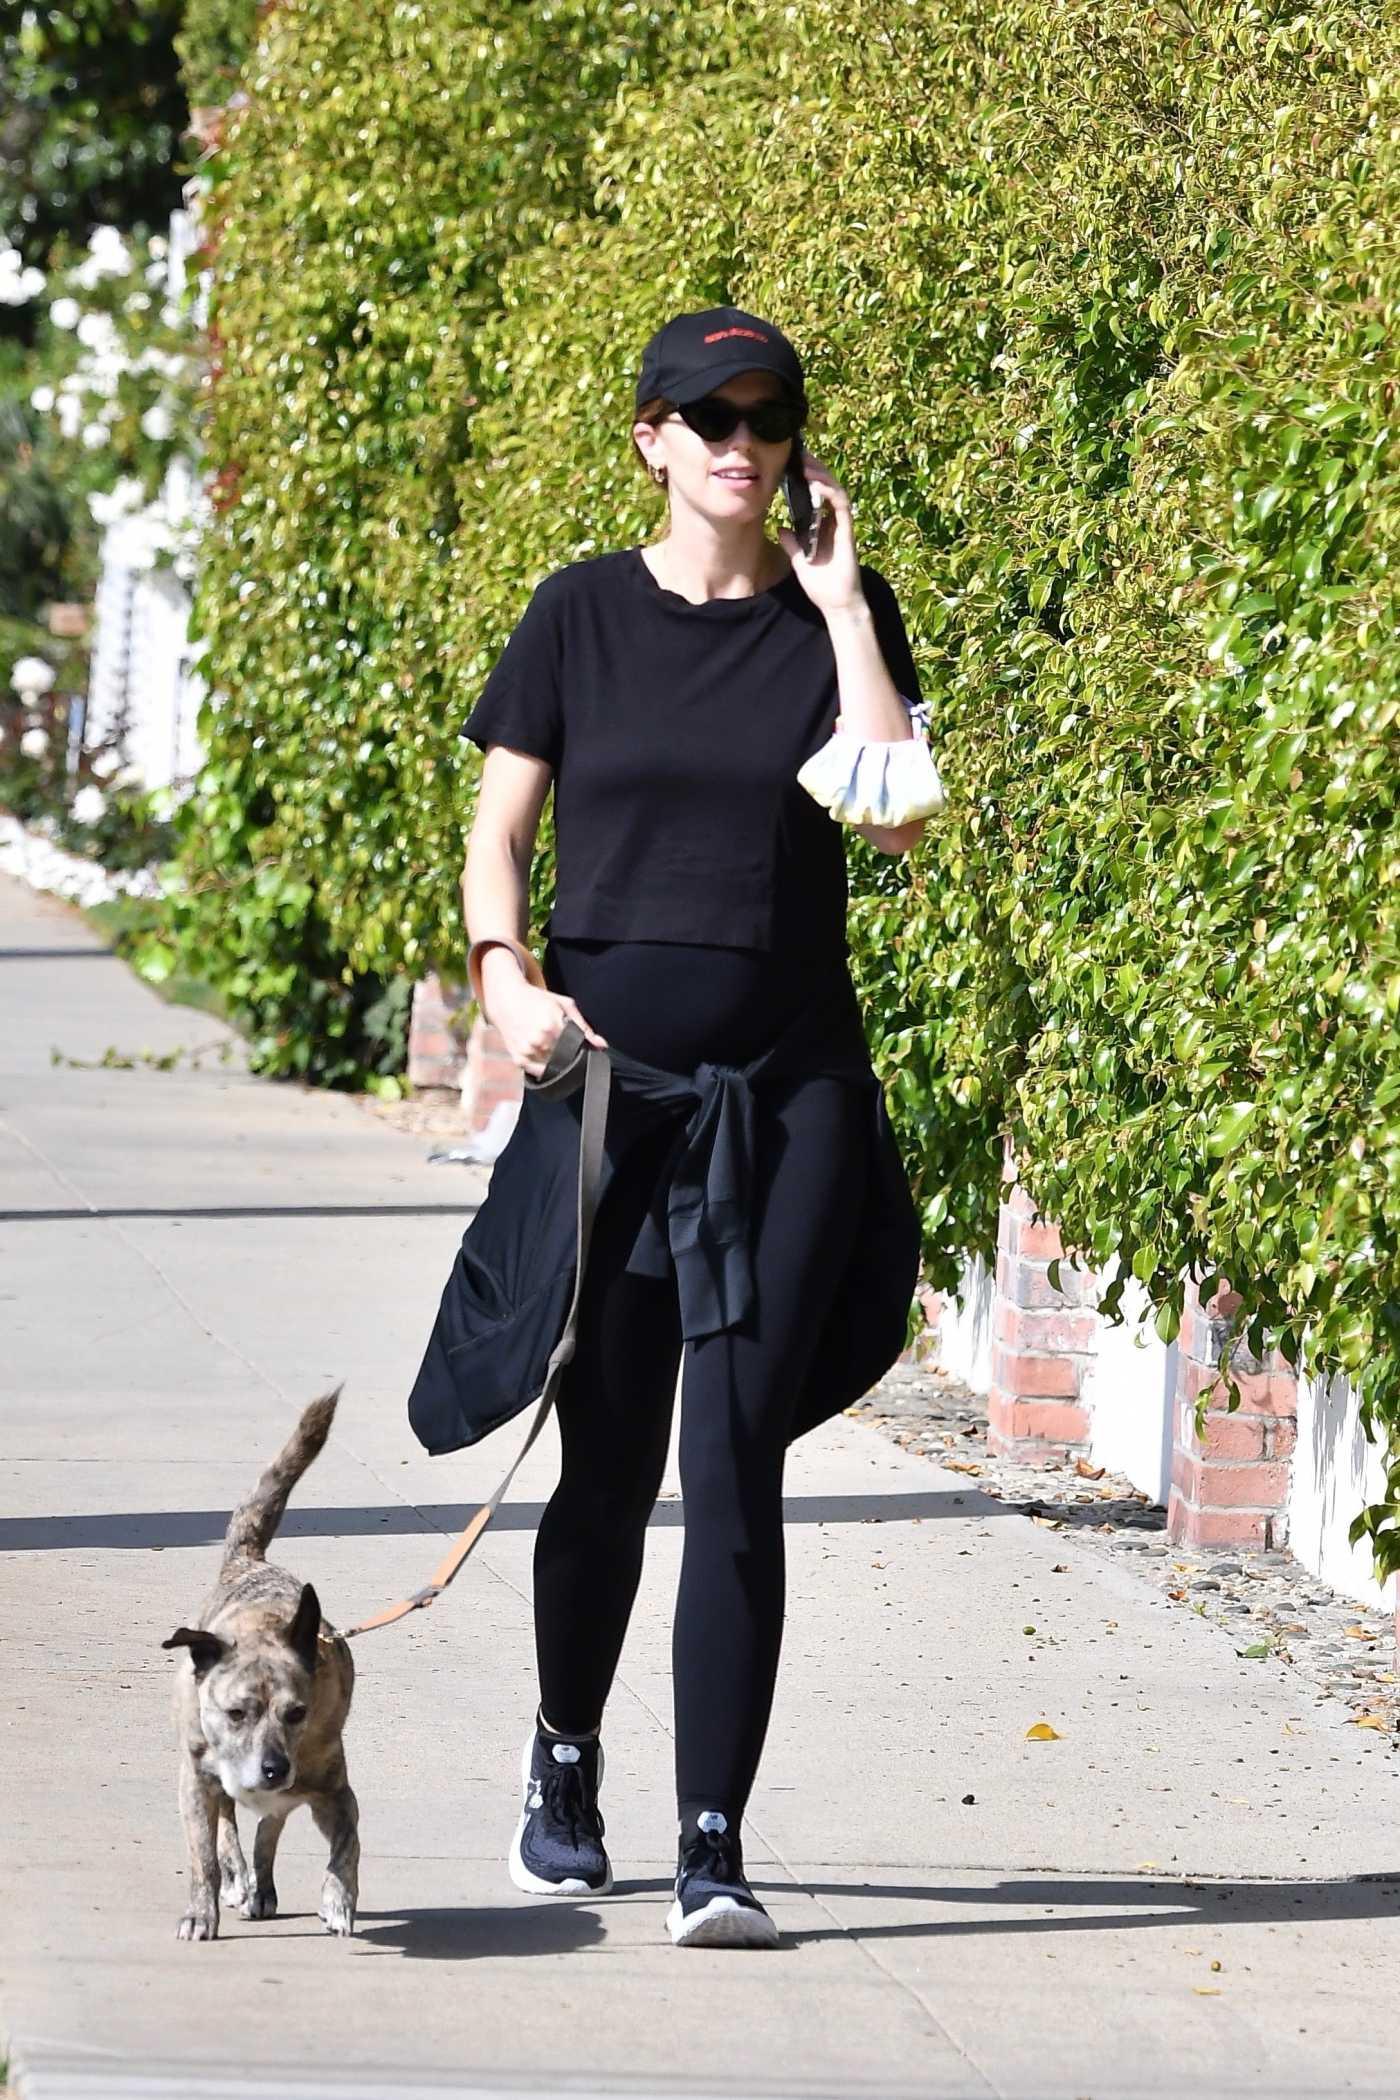 Katherine Schwarzenegger in a Black Cap Walks Her Dog in Brentwood 05/02/2020